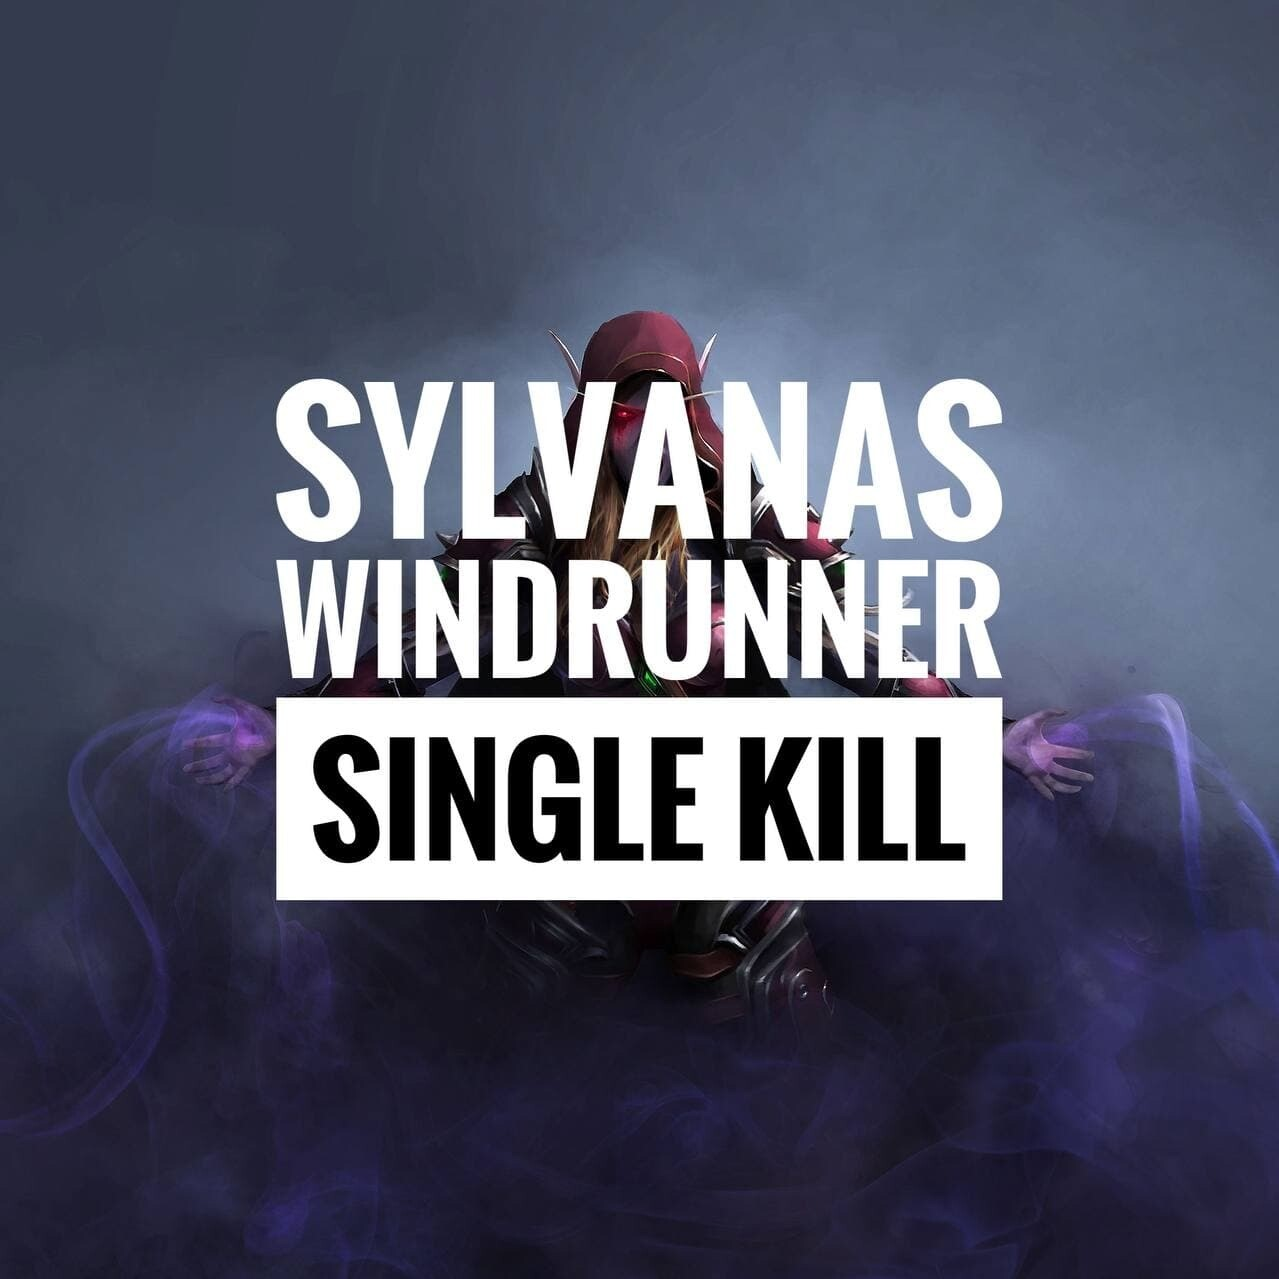 SYLVANAS WINDRUNNER BOOST NORMAL/HEROIC